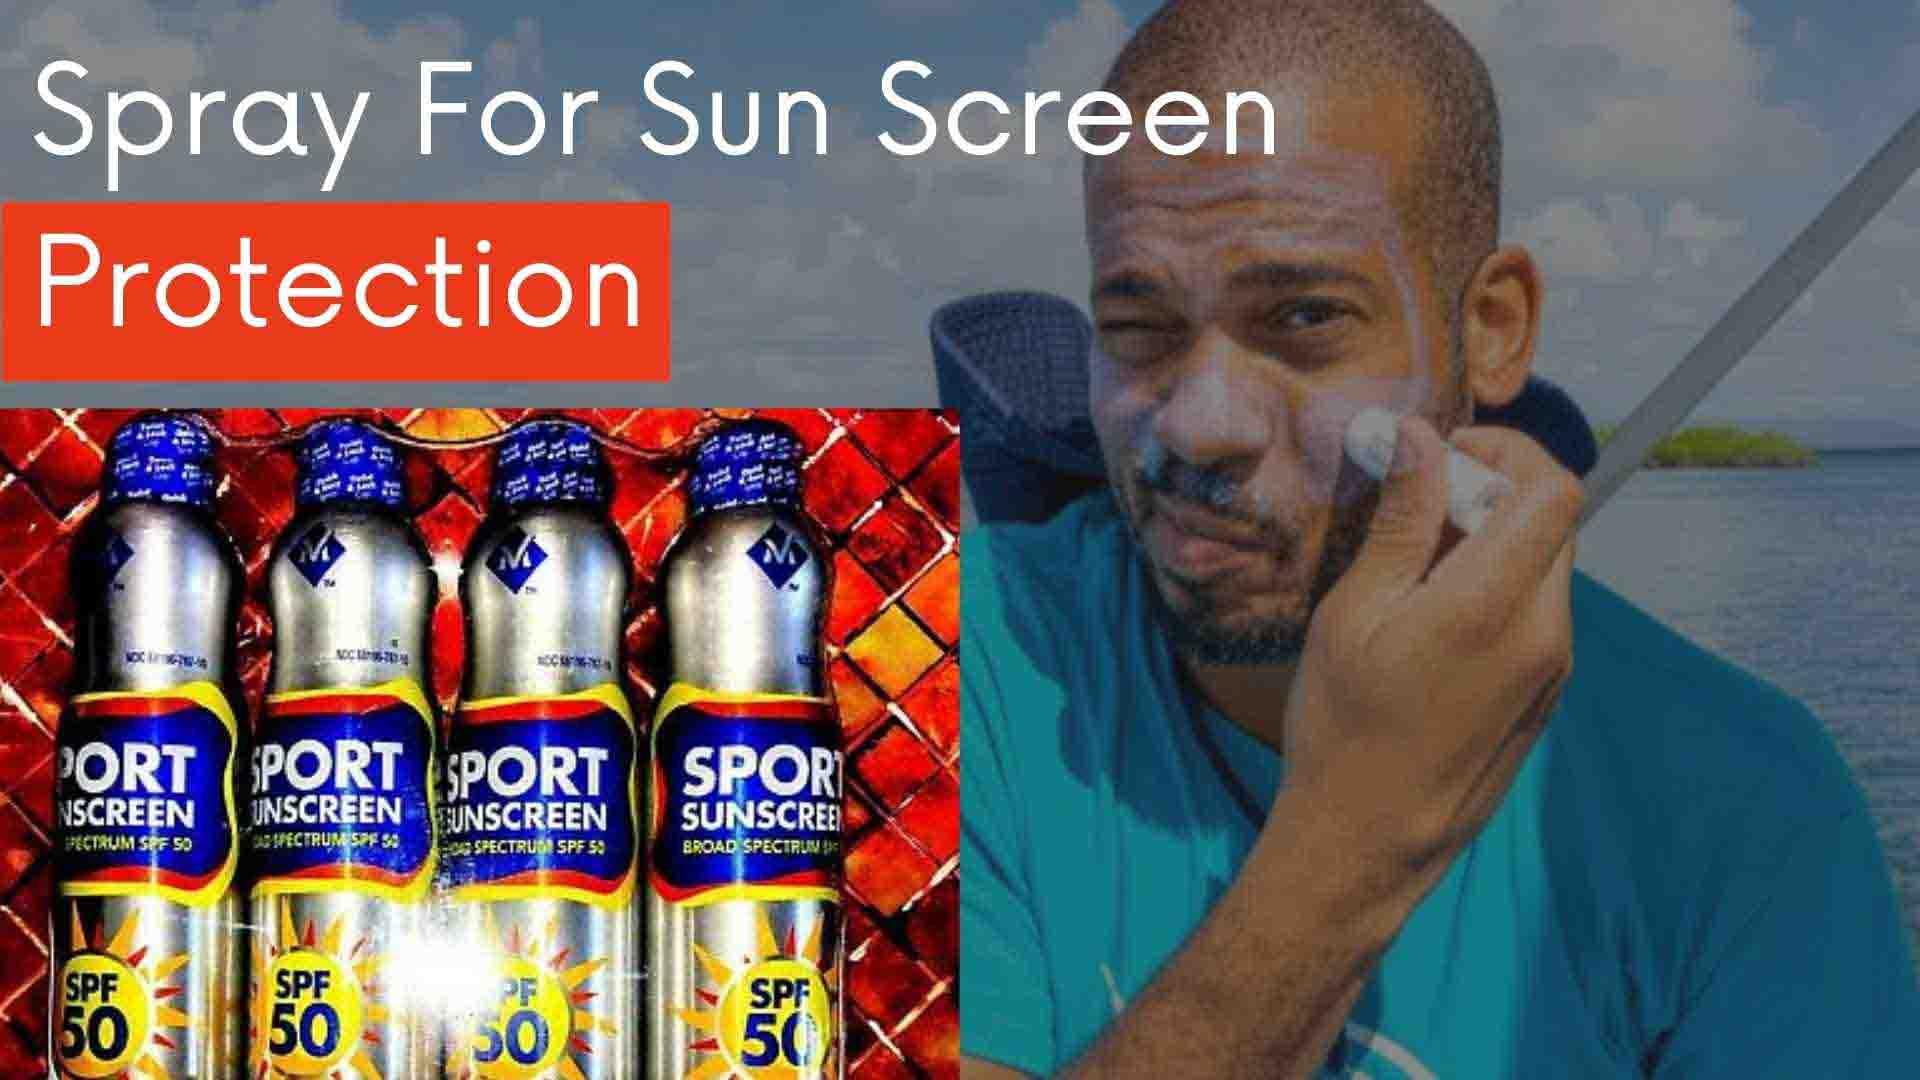 Sport Sunscreen Spray Spf 50 Make Best Sunscreen For Face